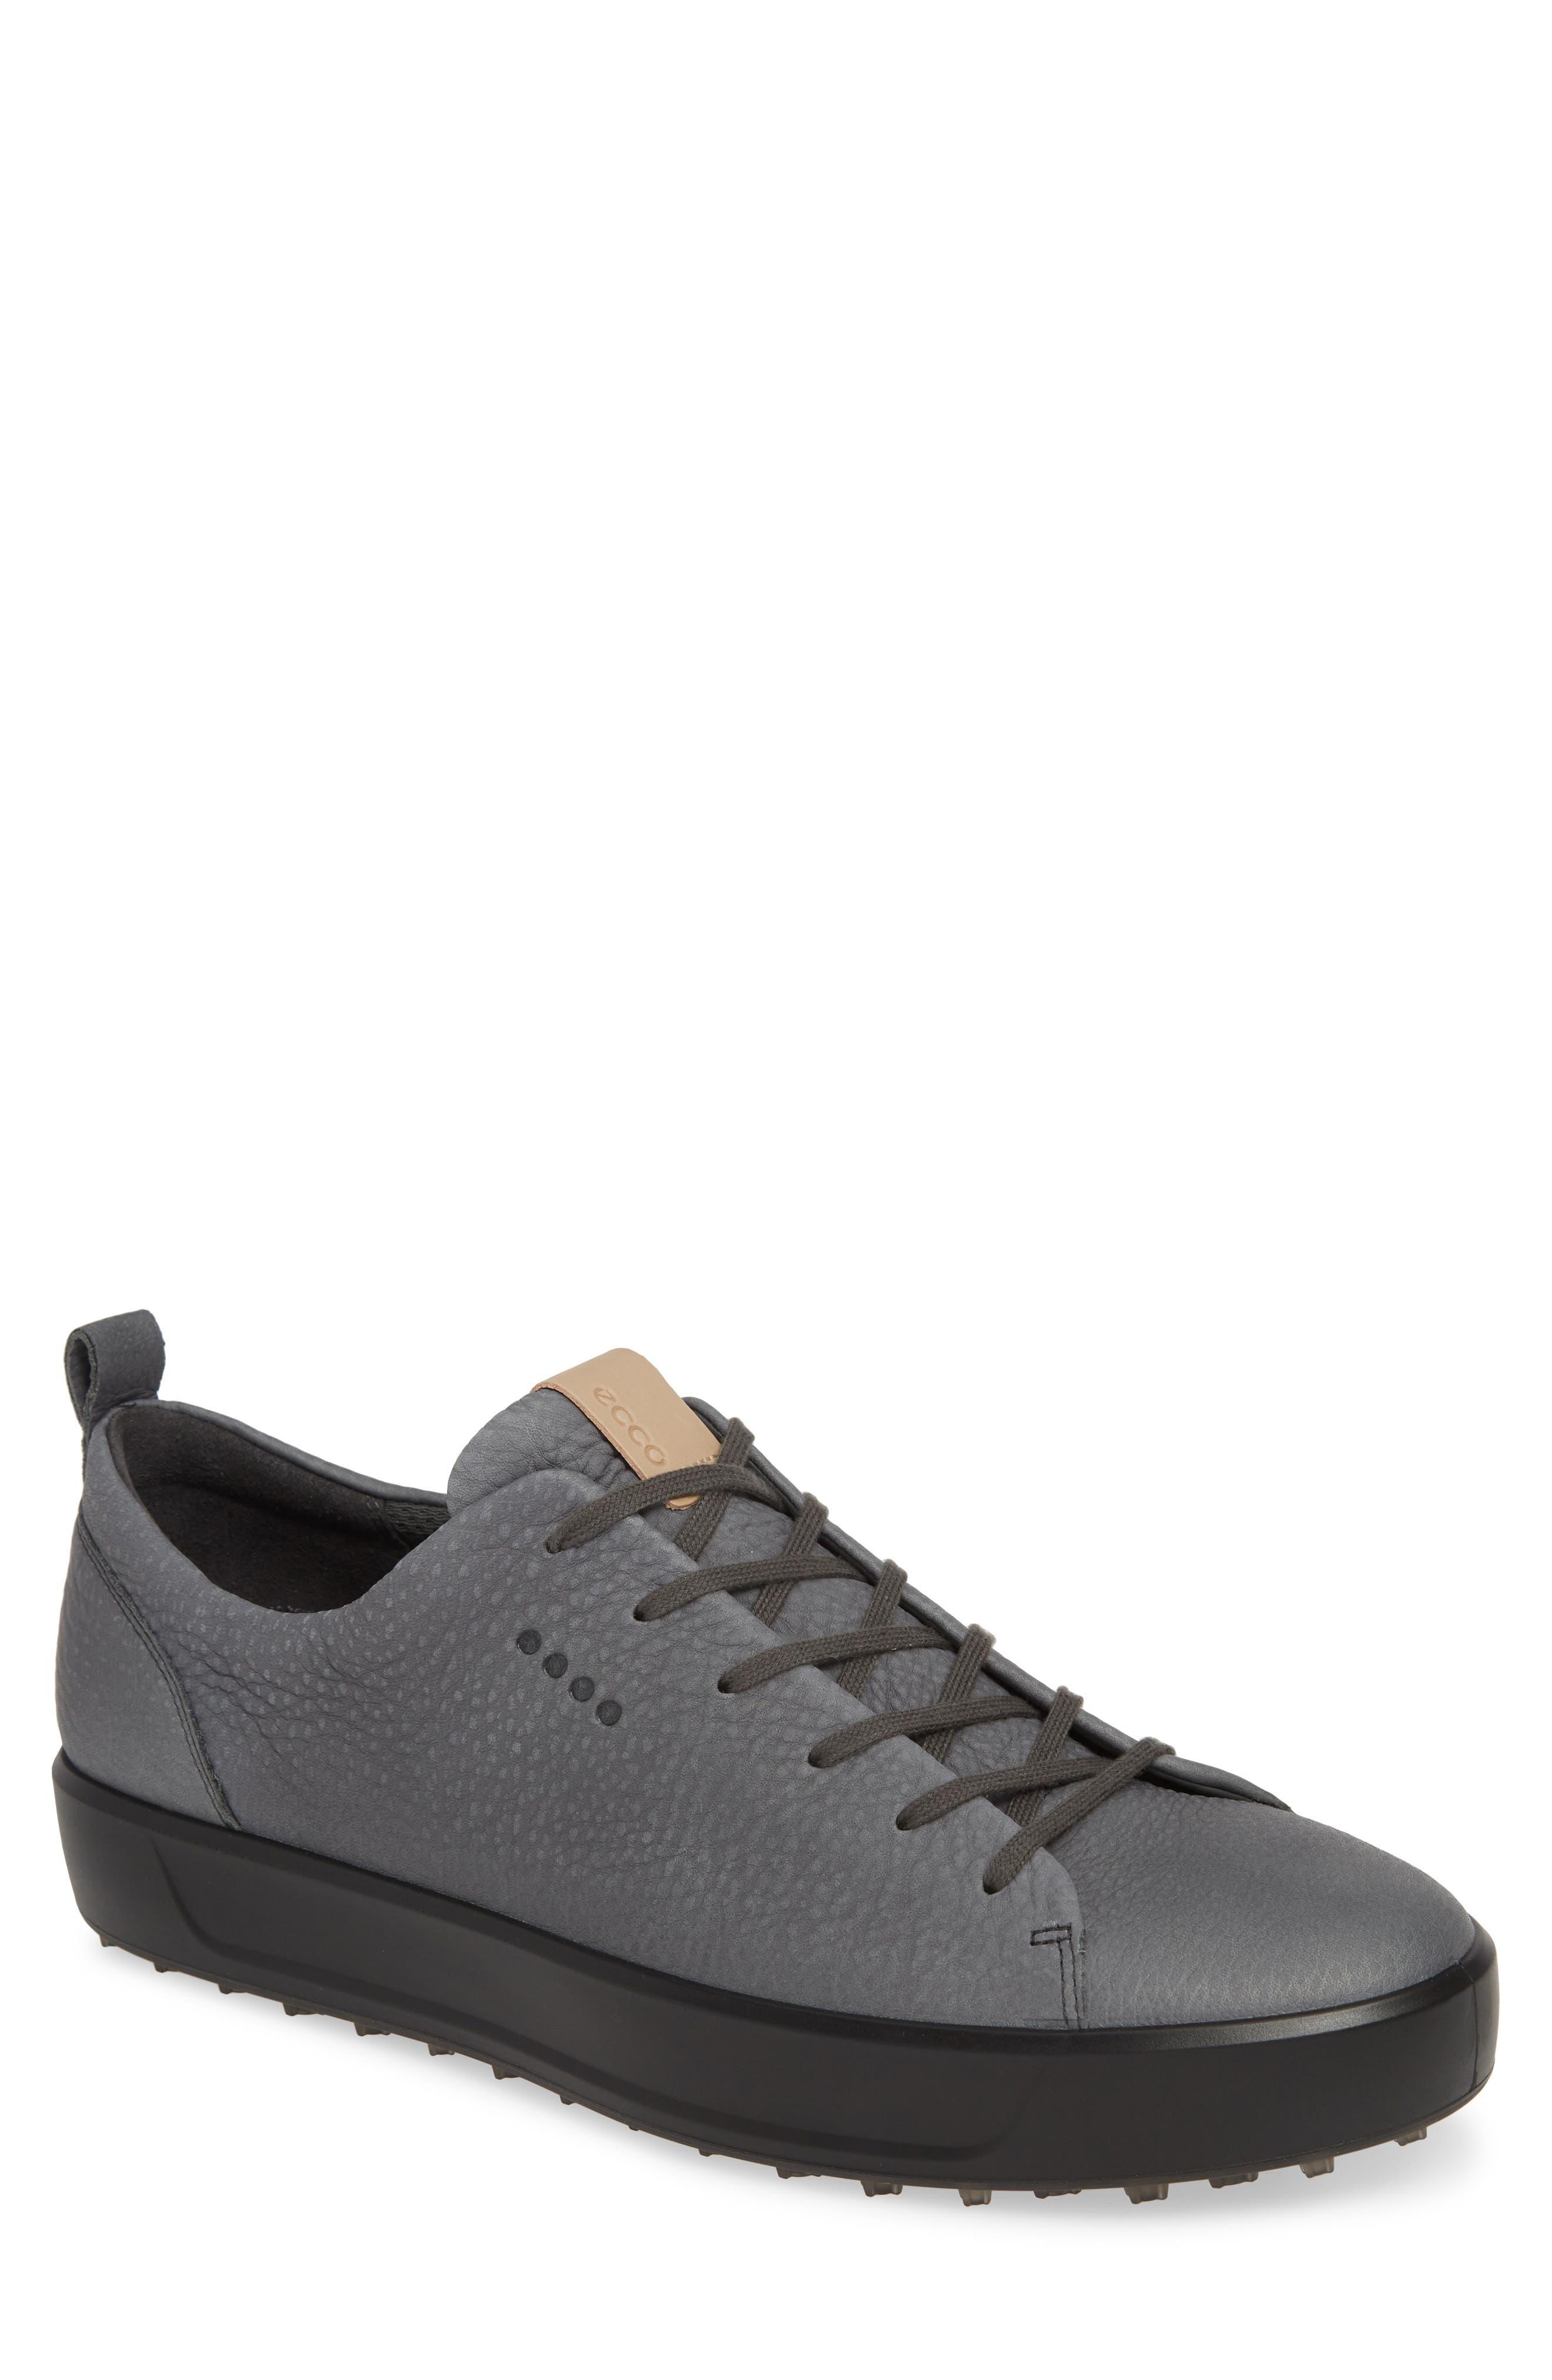 ECCO Hydromax<sup>®</sup> Golf Shoe, Main, color, DARK SHADOW LEATHER